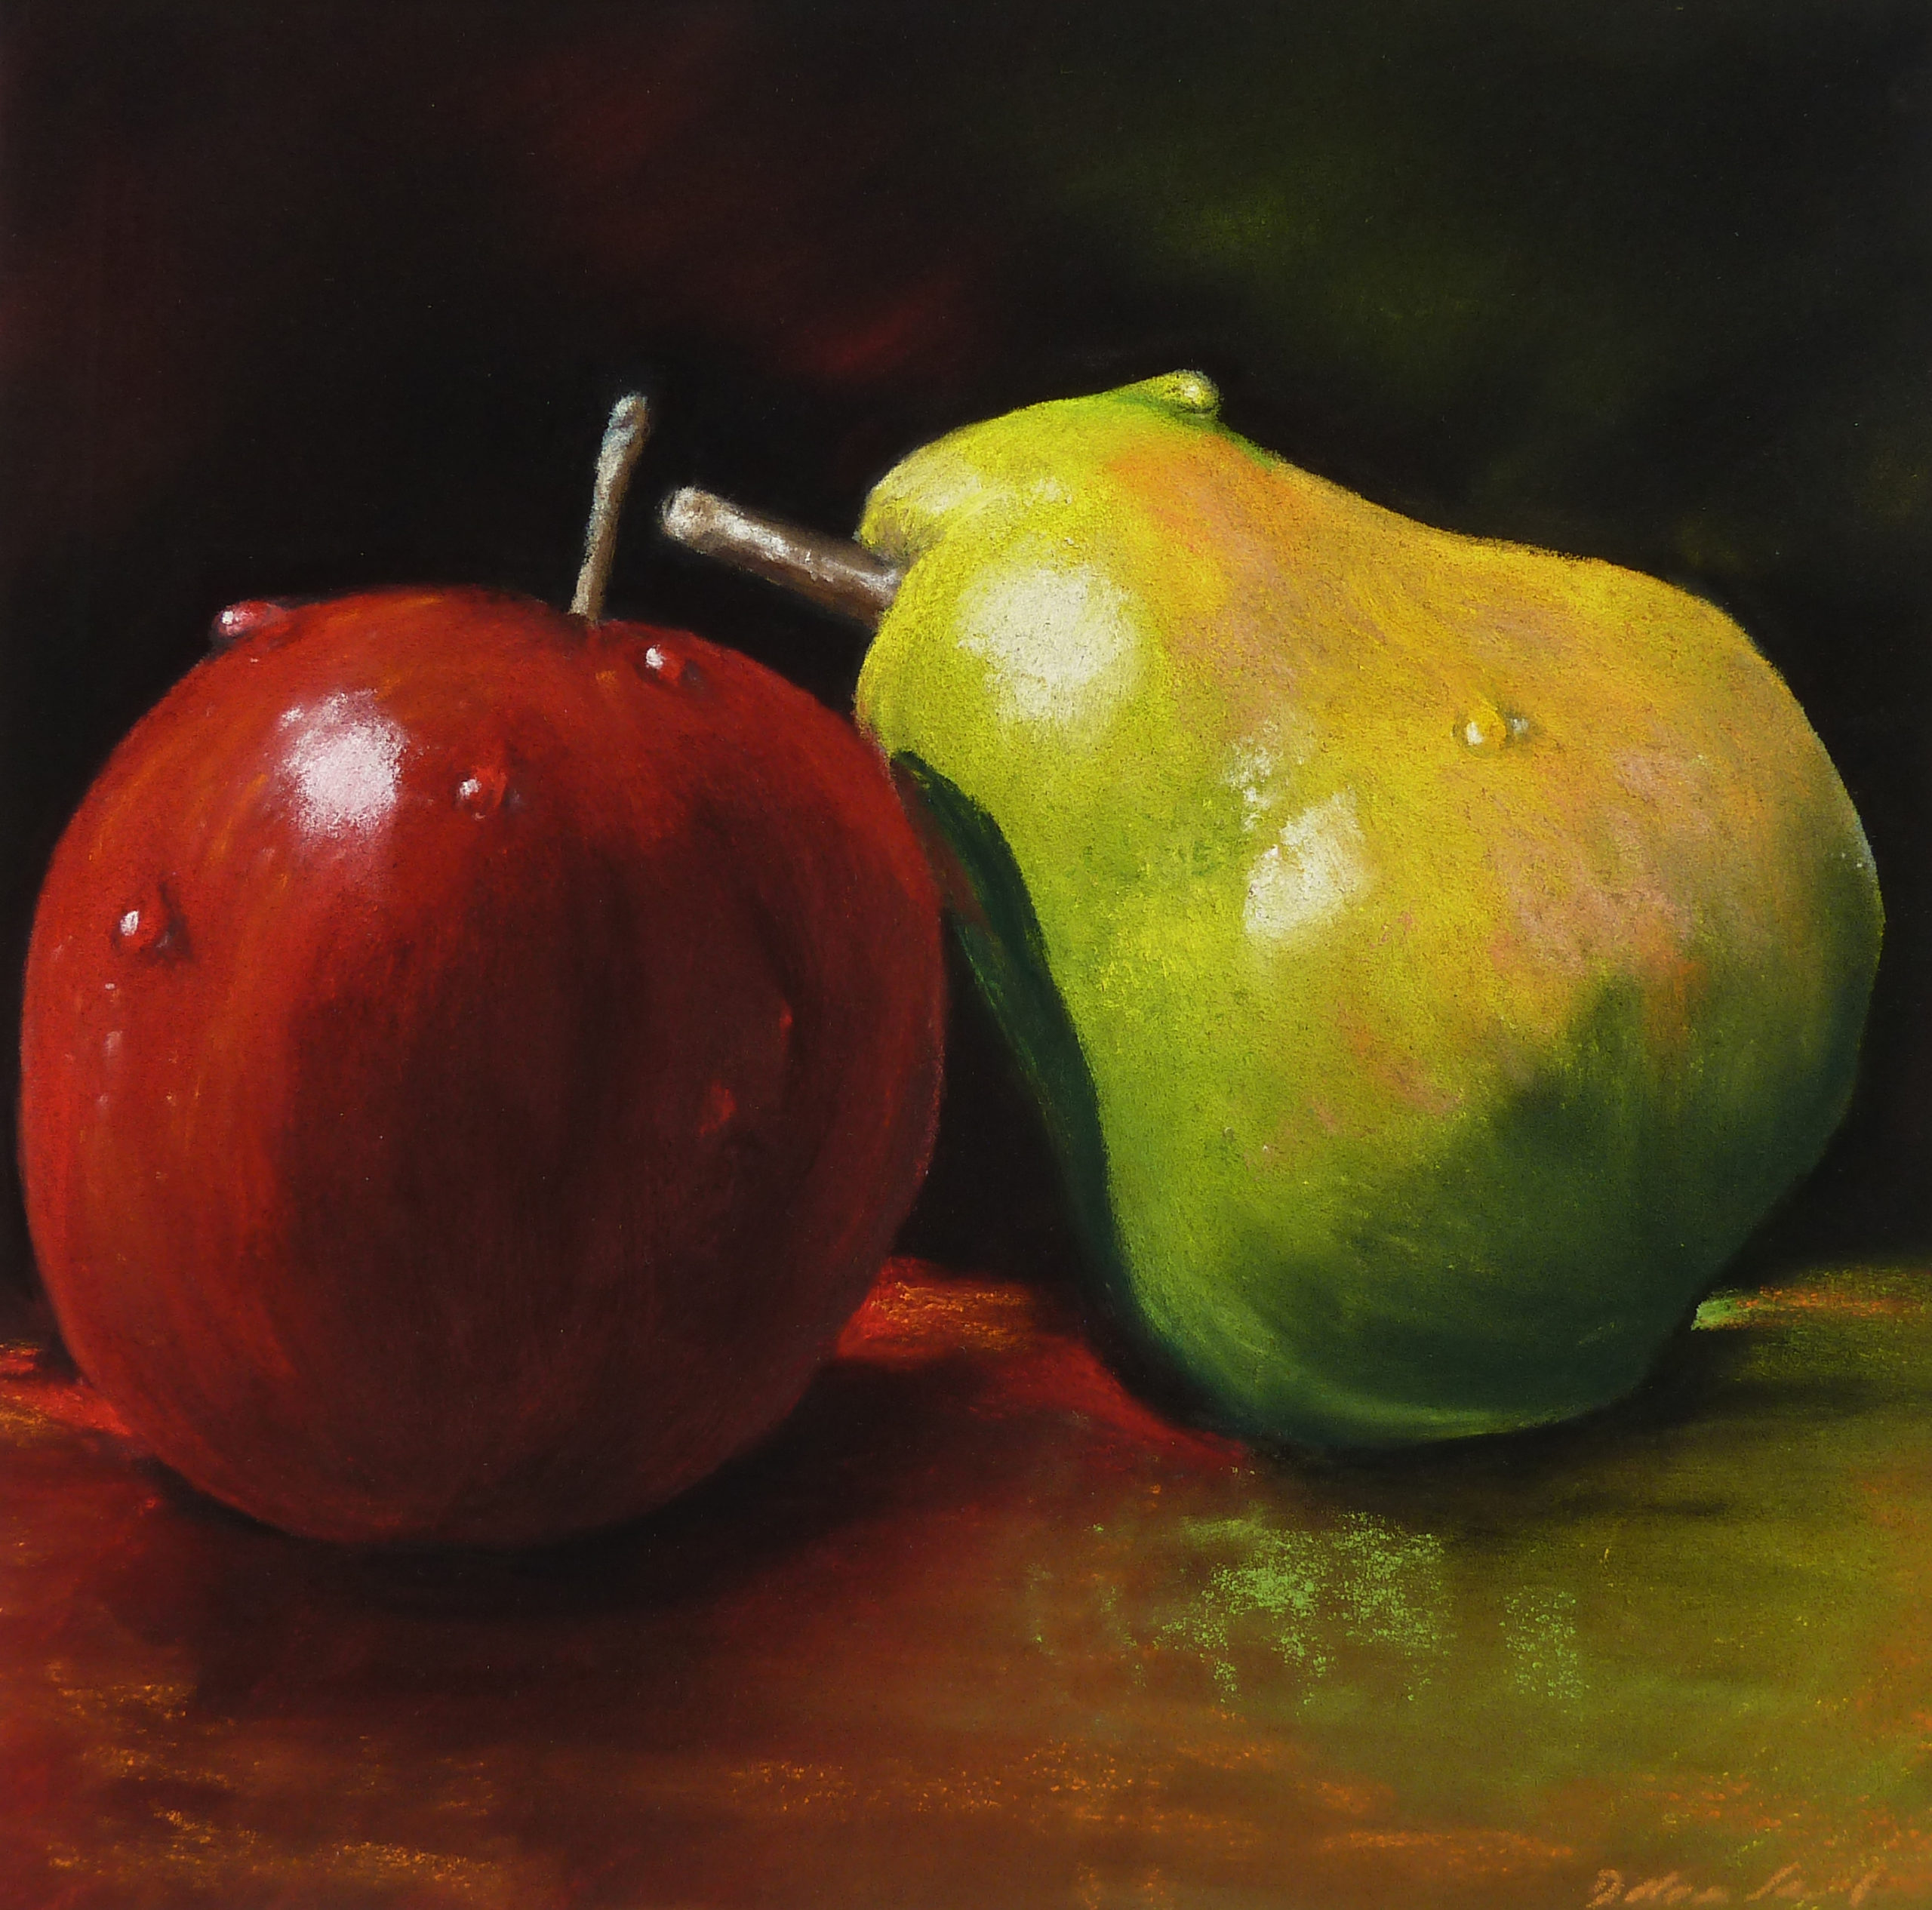 Pear loves Appel_D.Saul